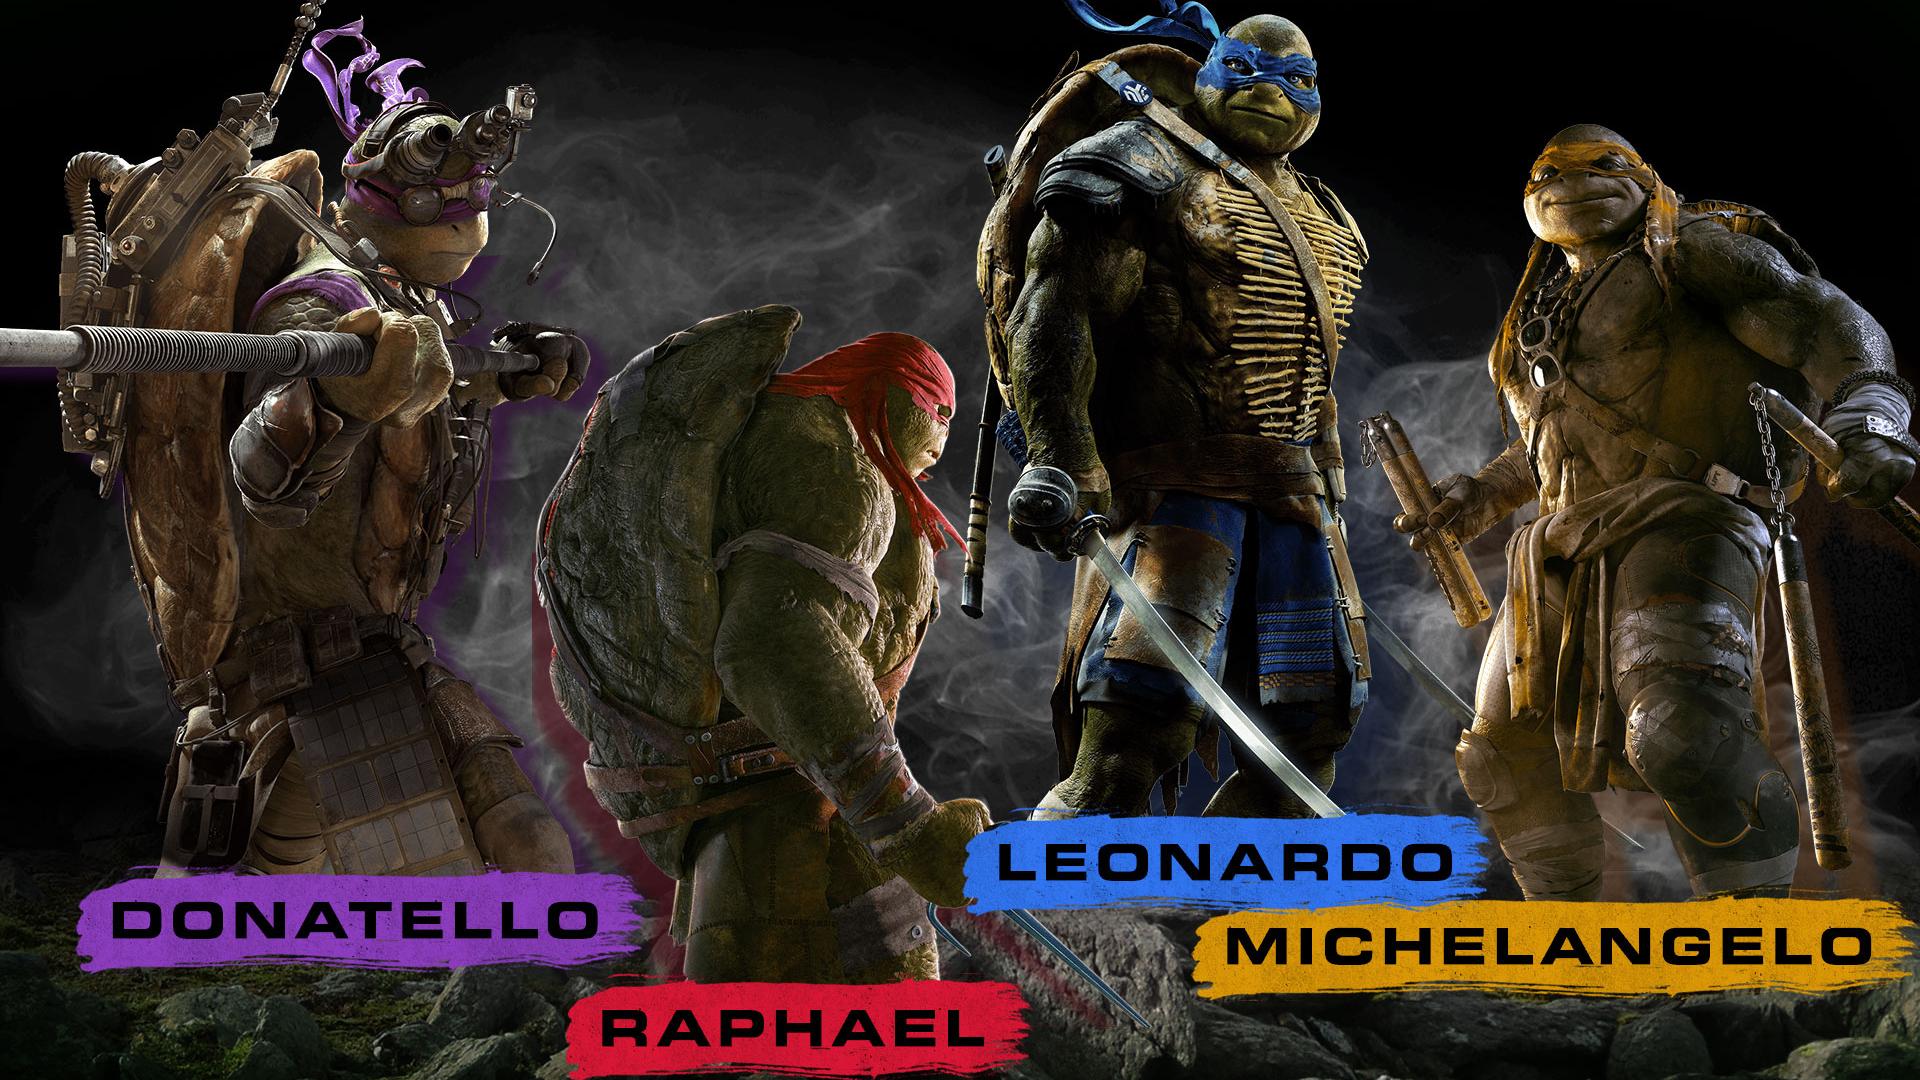 Free Download Wallpaper Hd 2 Teenage Mutant Ninja Turtles Tmnt